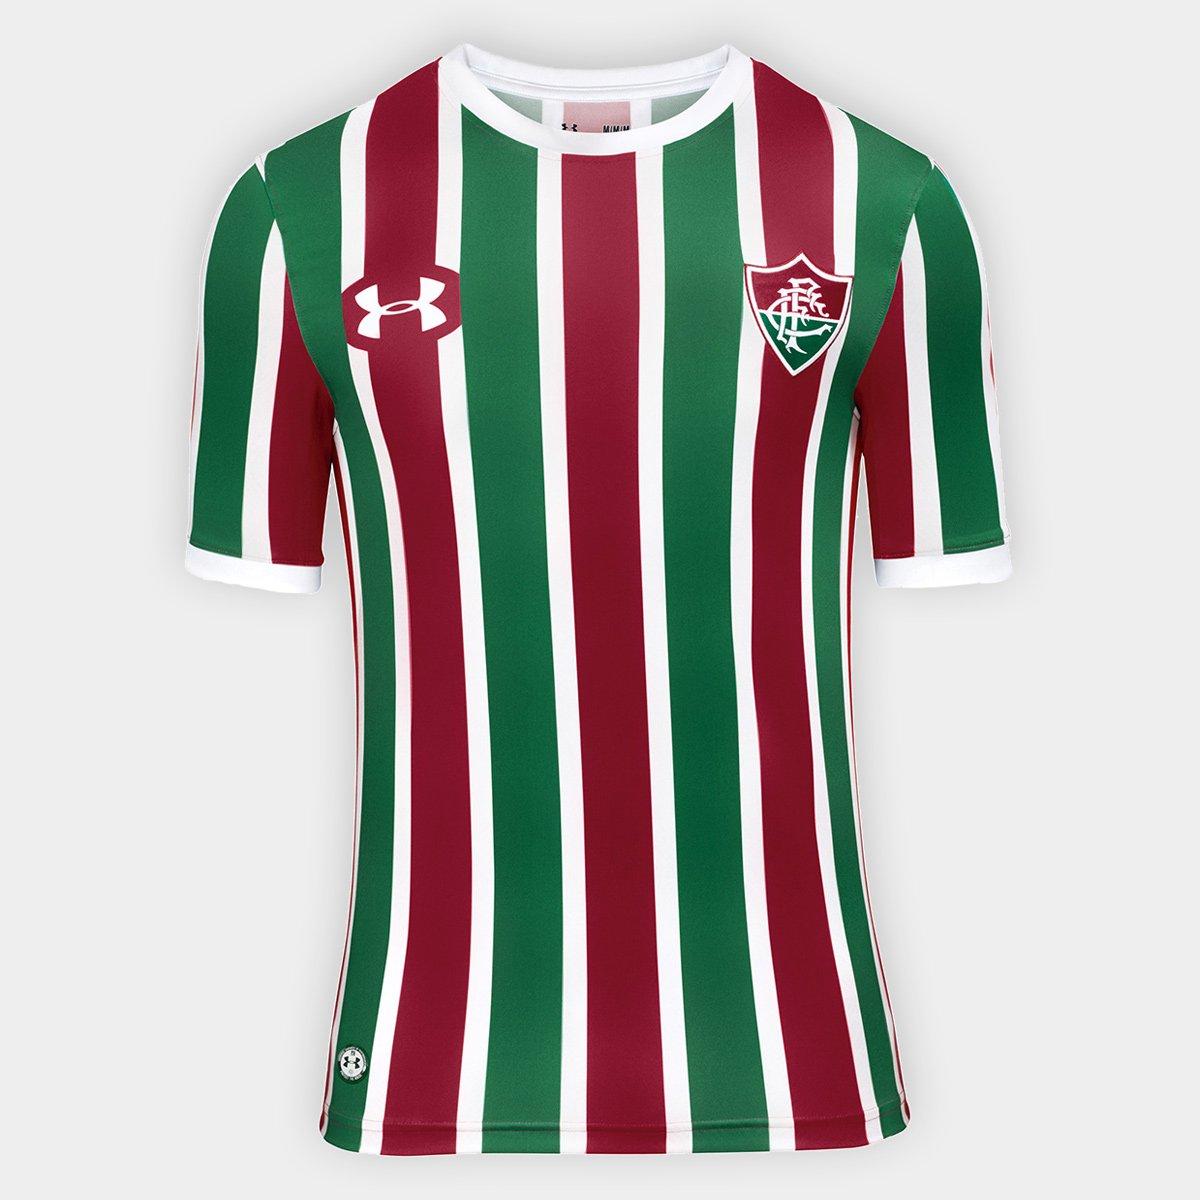 f8f6cd8cc4 ... Camisa Fluminense I 17 18 P.H. Ganso nº 10 Torcedor Under Armour  Masculina